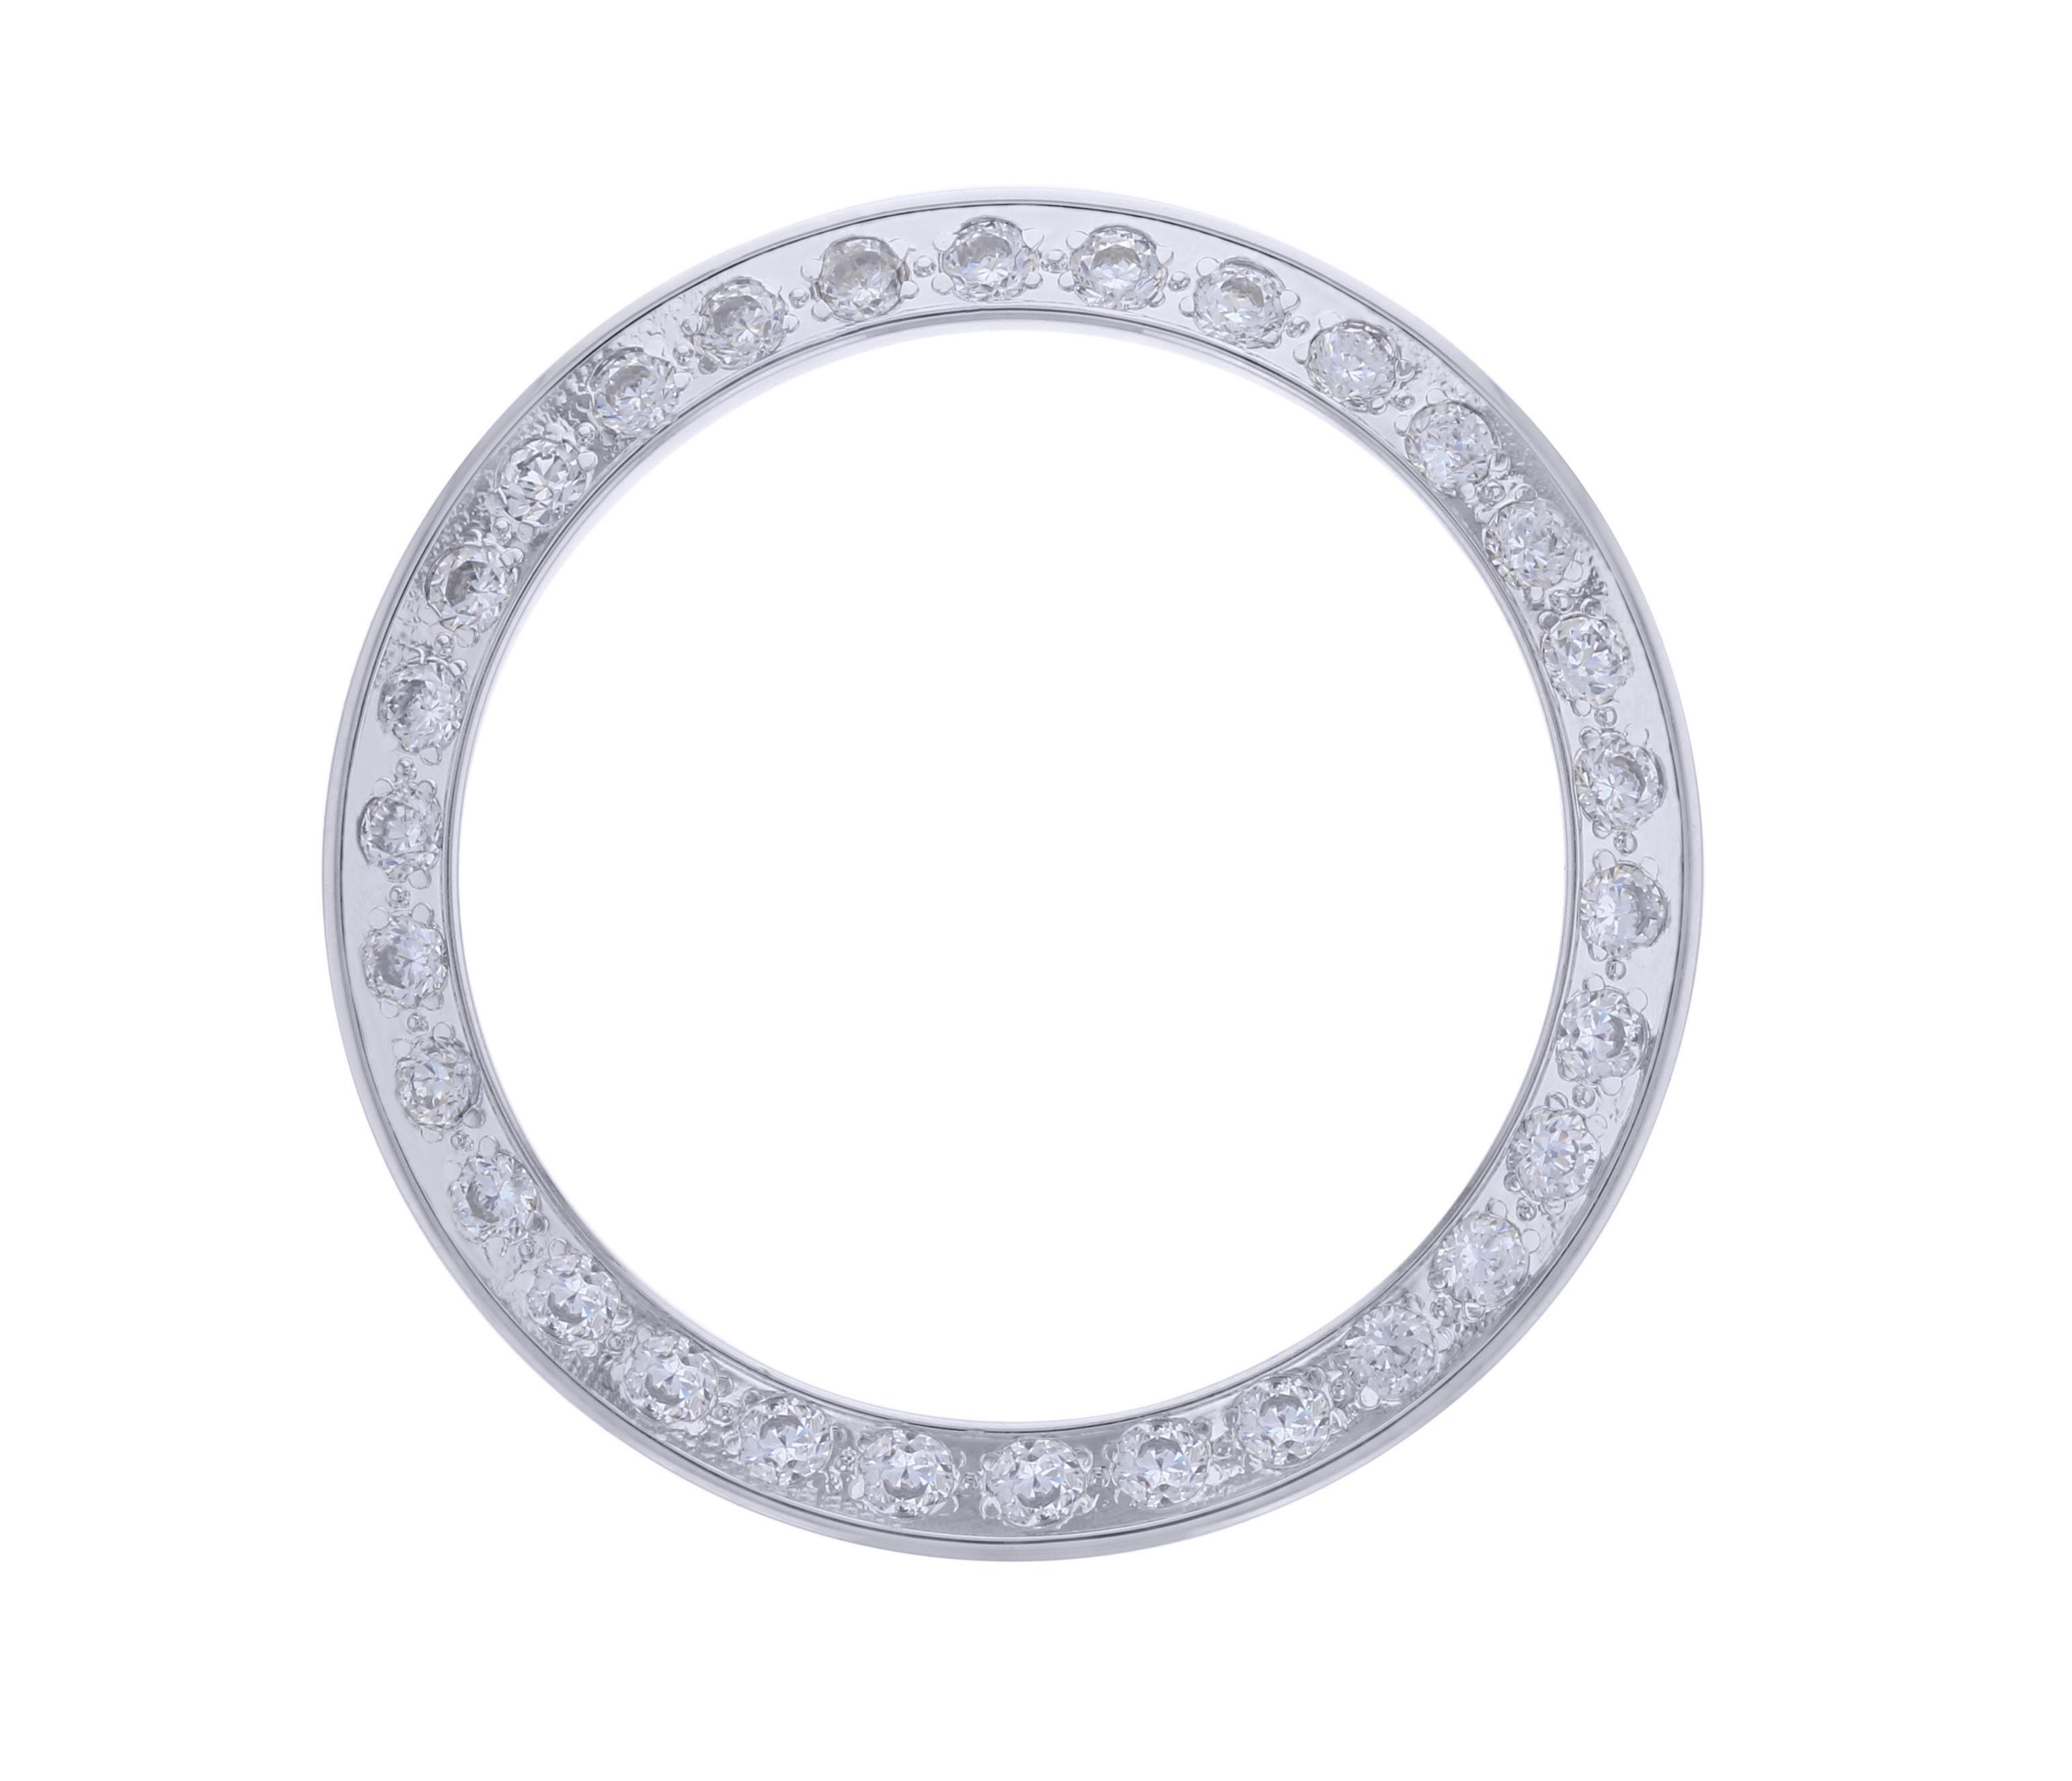 WHITE GP CREATED DIAMOND BEZEL FOR 26MM TUDOR DATE DATEJUST 16503 92413 WATCH